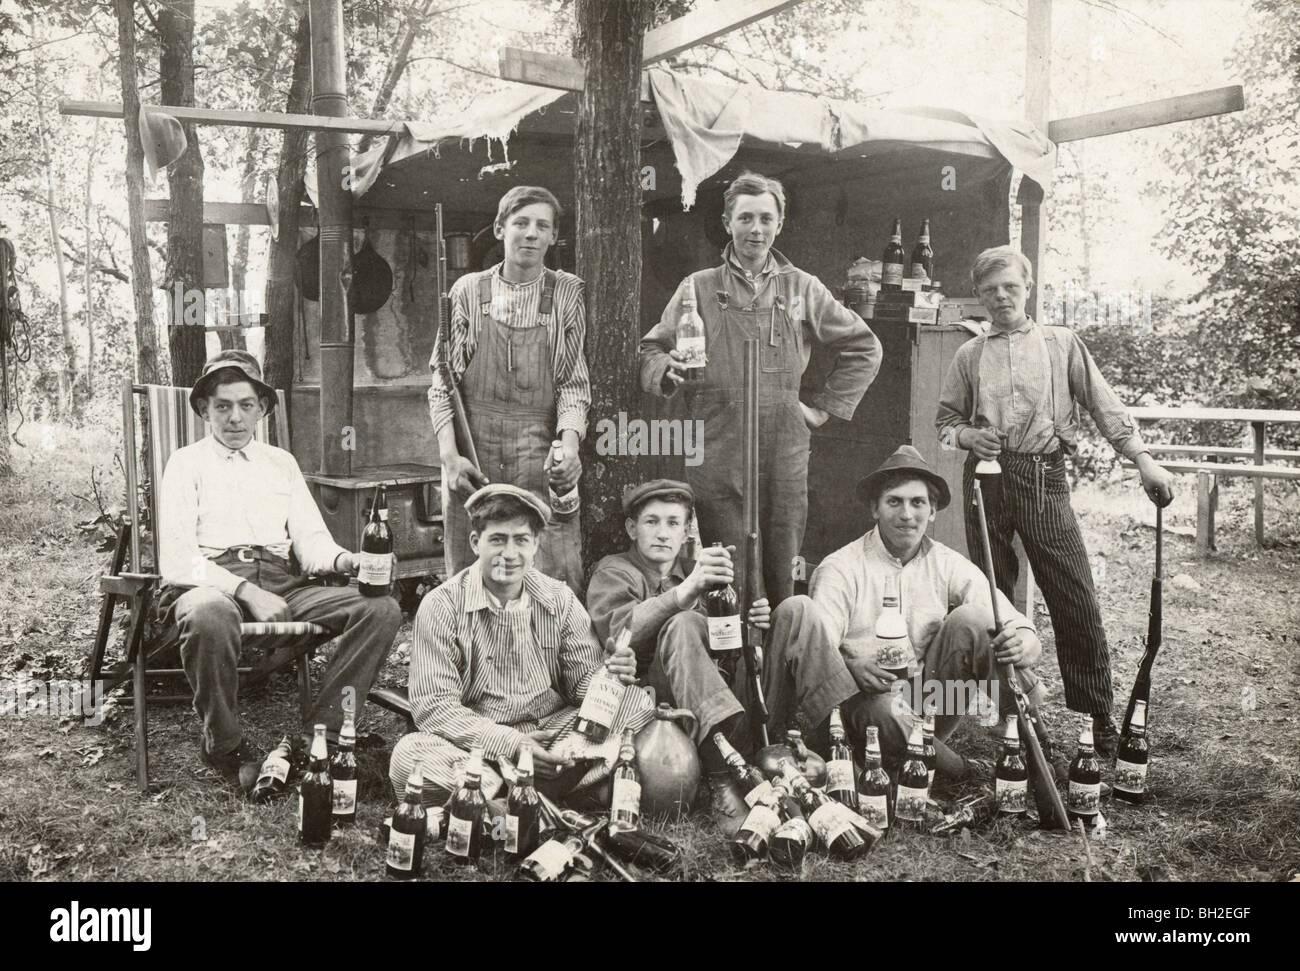 Siete muchachos armados rodeados por docenas de botellas de licor Imagen De Stock